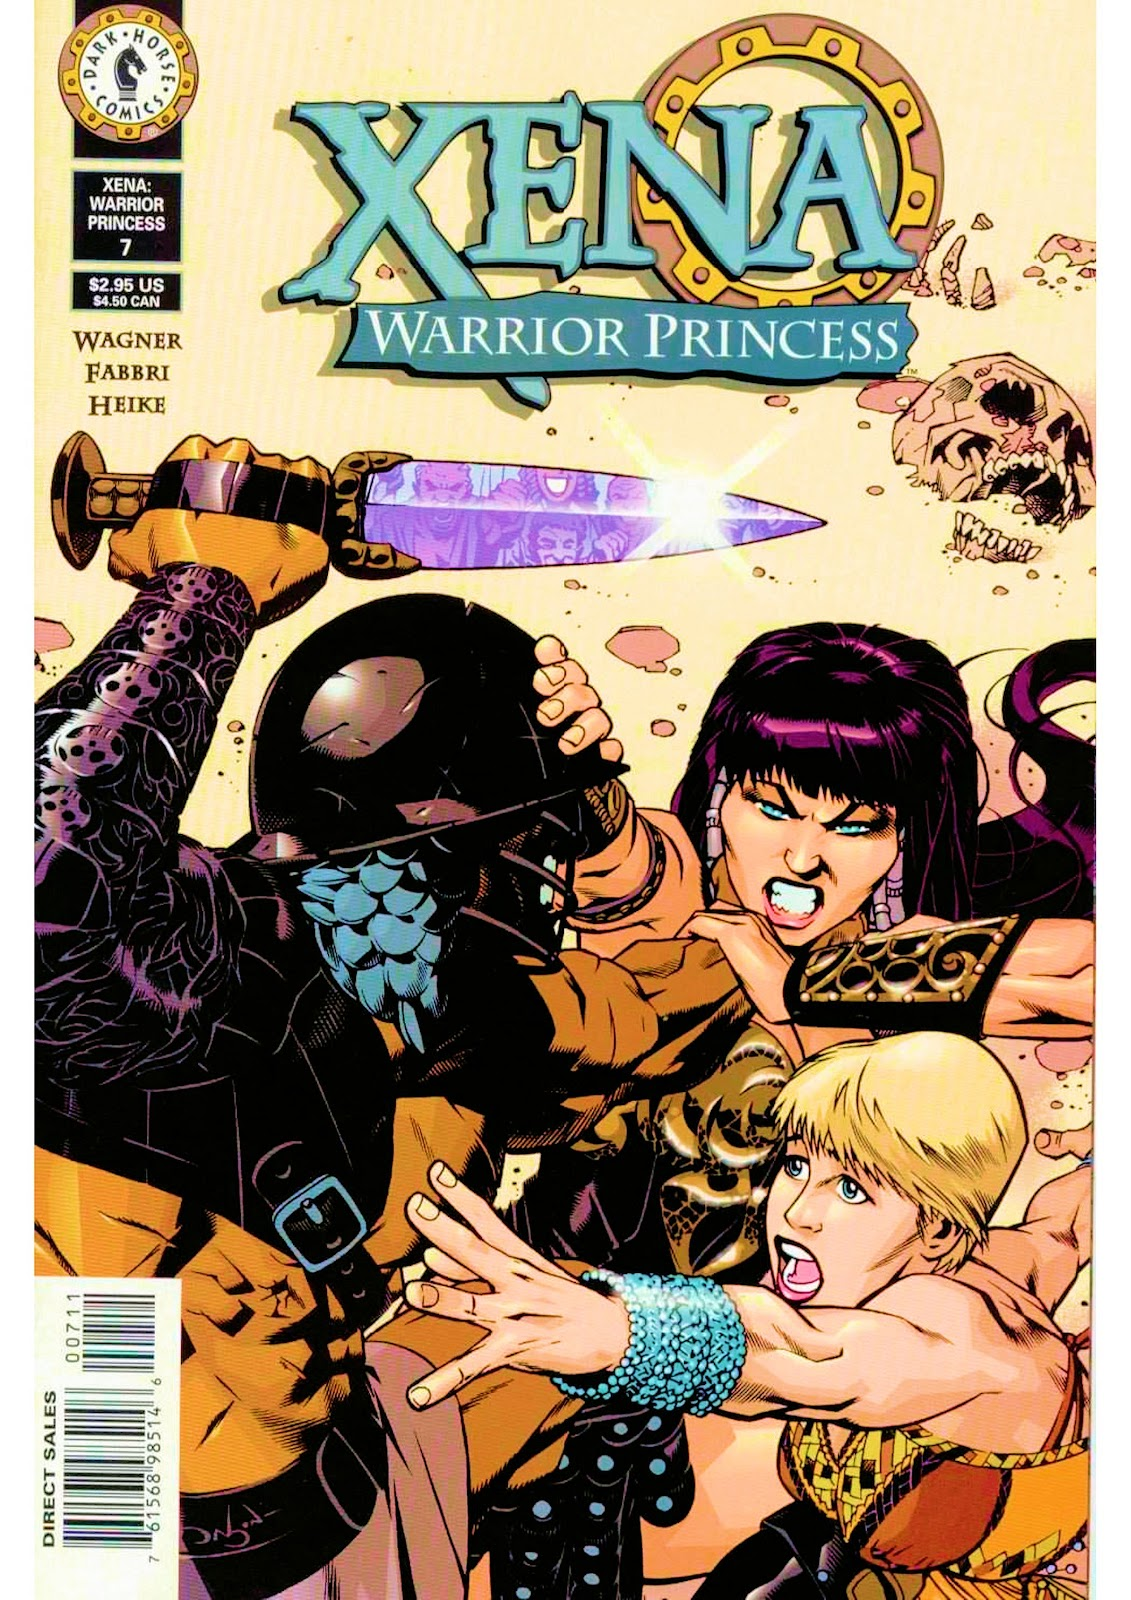 Xena: Warrior Princess (1999) Issue #7 #7 - English 2